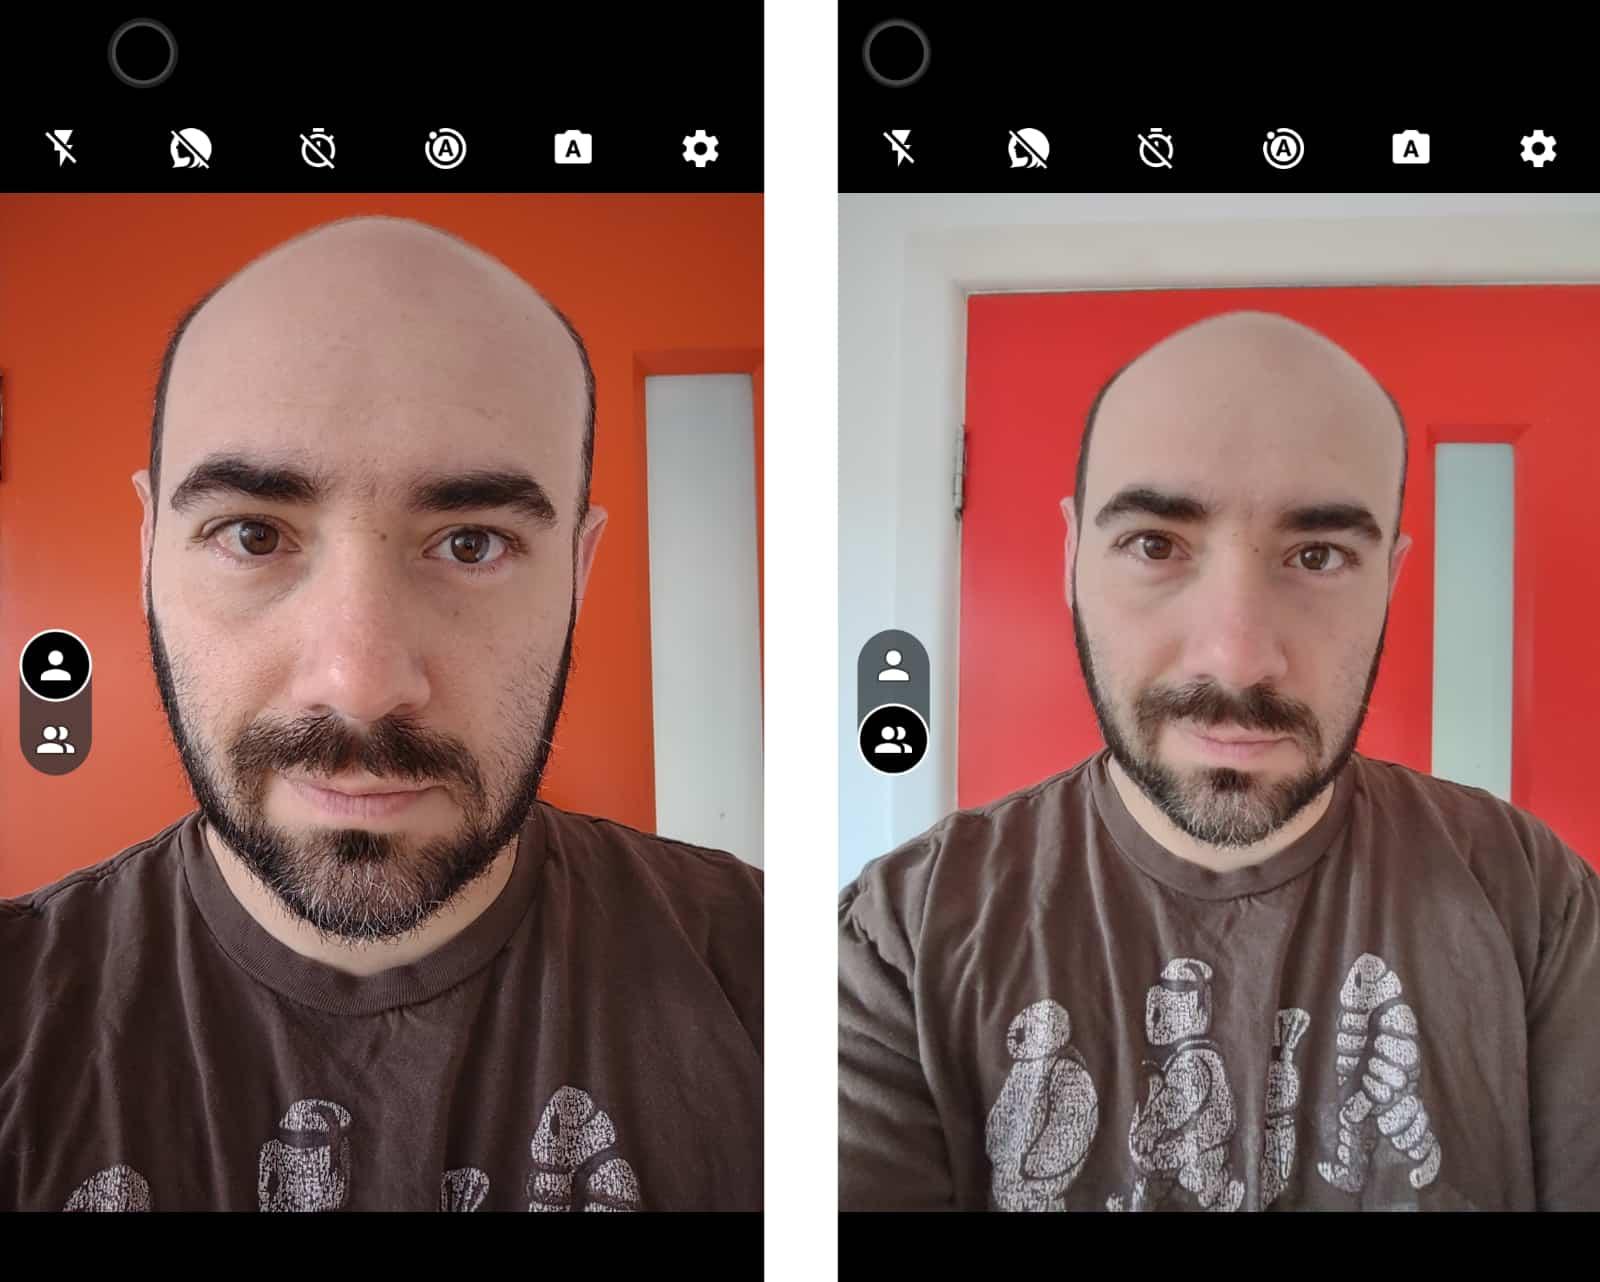 Moto G 5G Plus selfie cameras